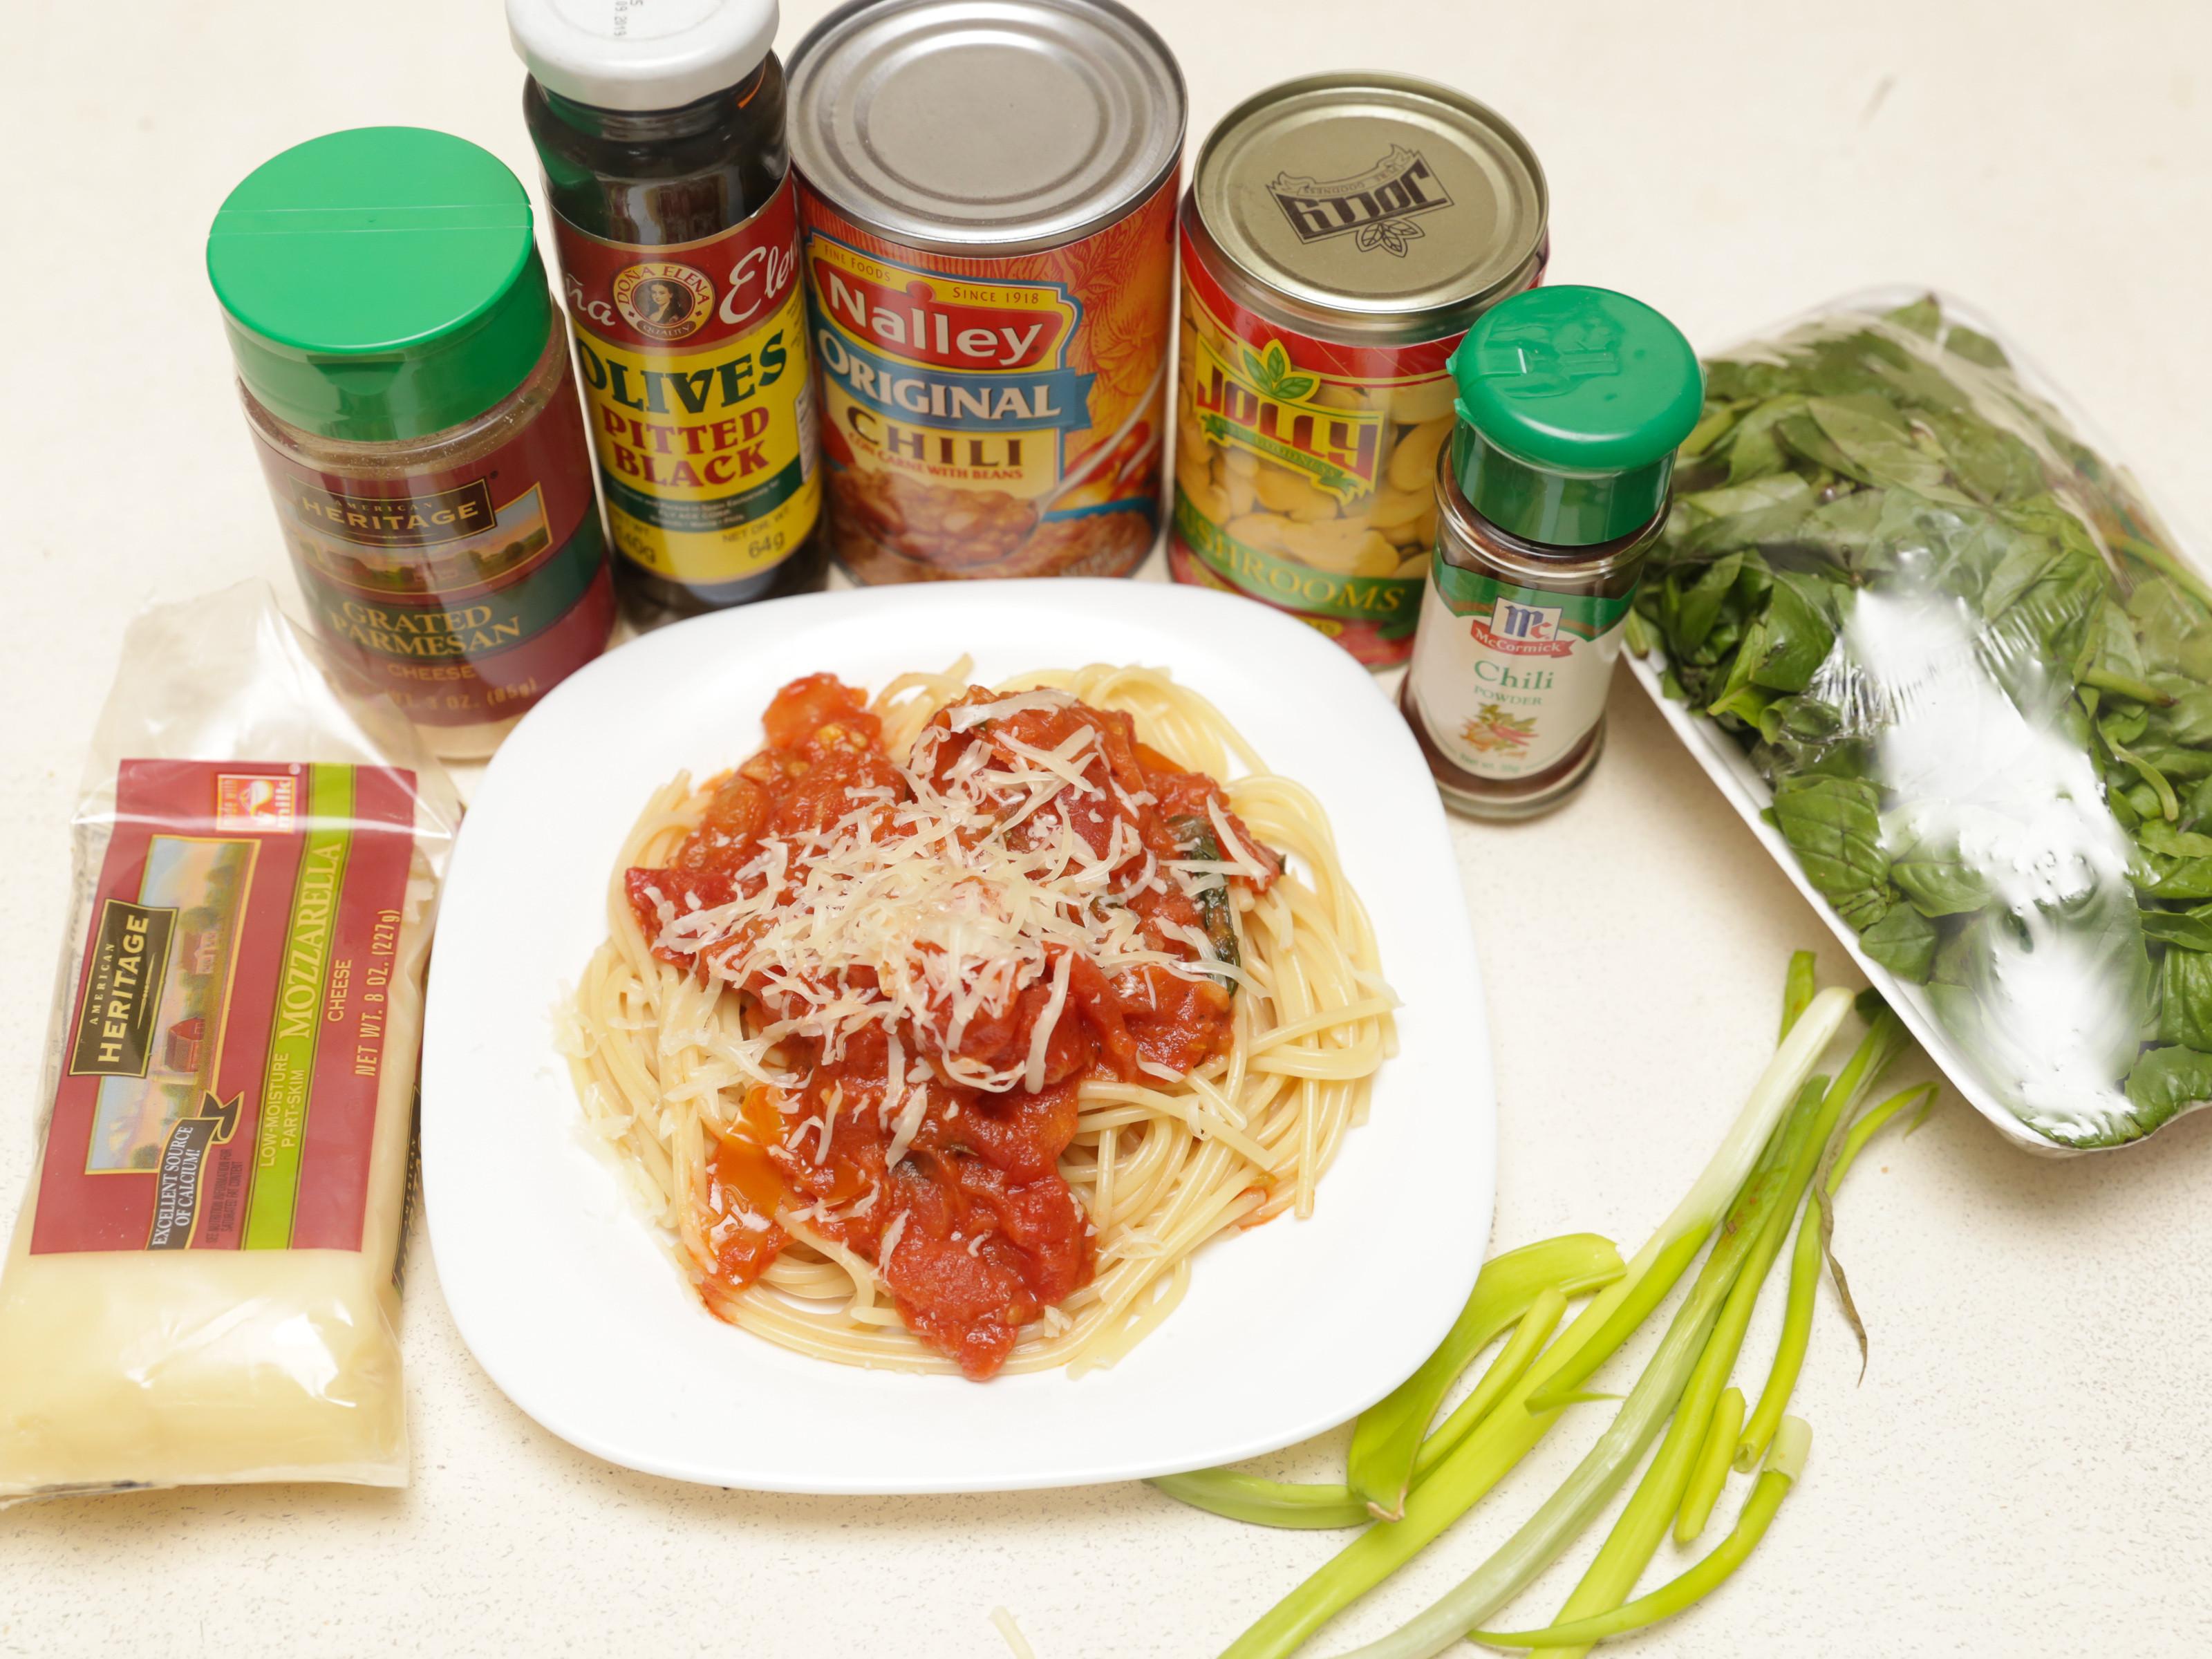 How To Make Spaghetti Sauce With Tomato Sauce  How to Make Spaghetti Sauce from Fresh Tomatoes 11 Steps